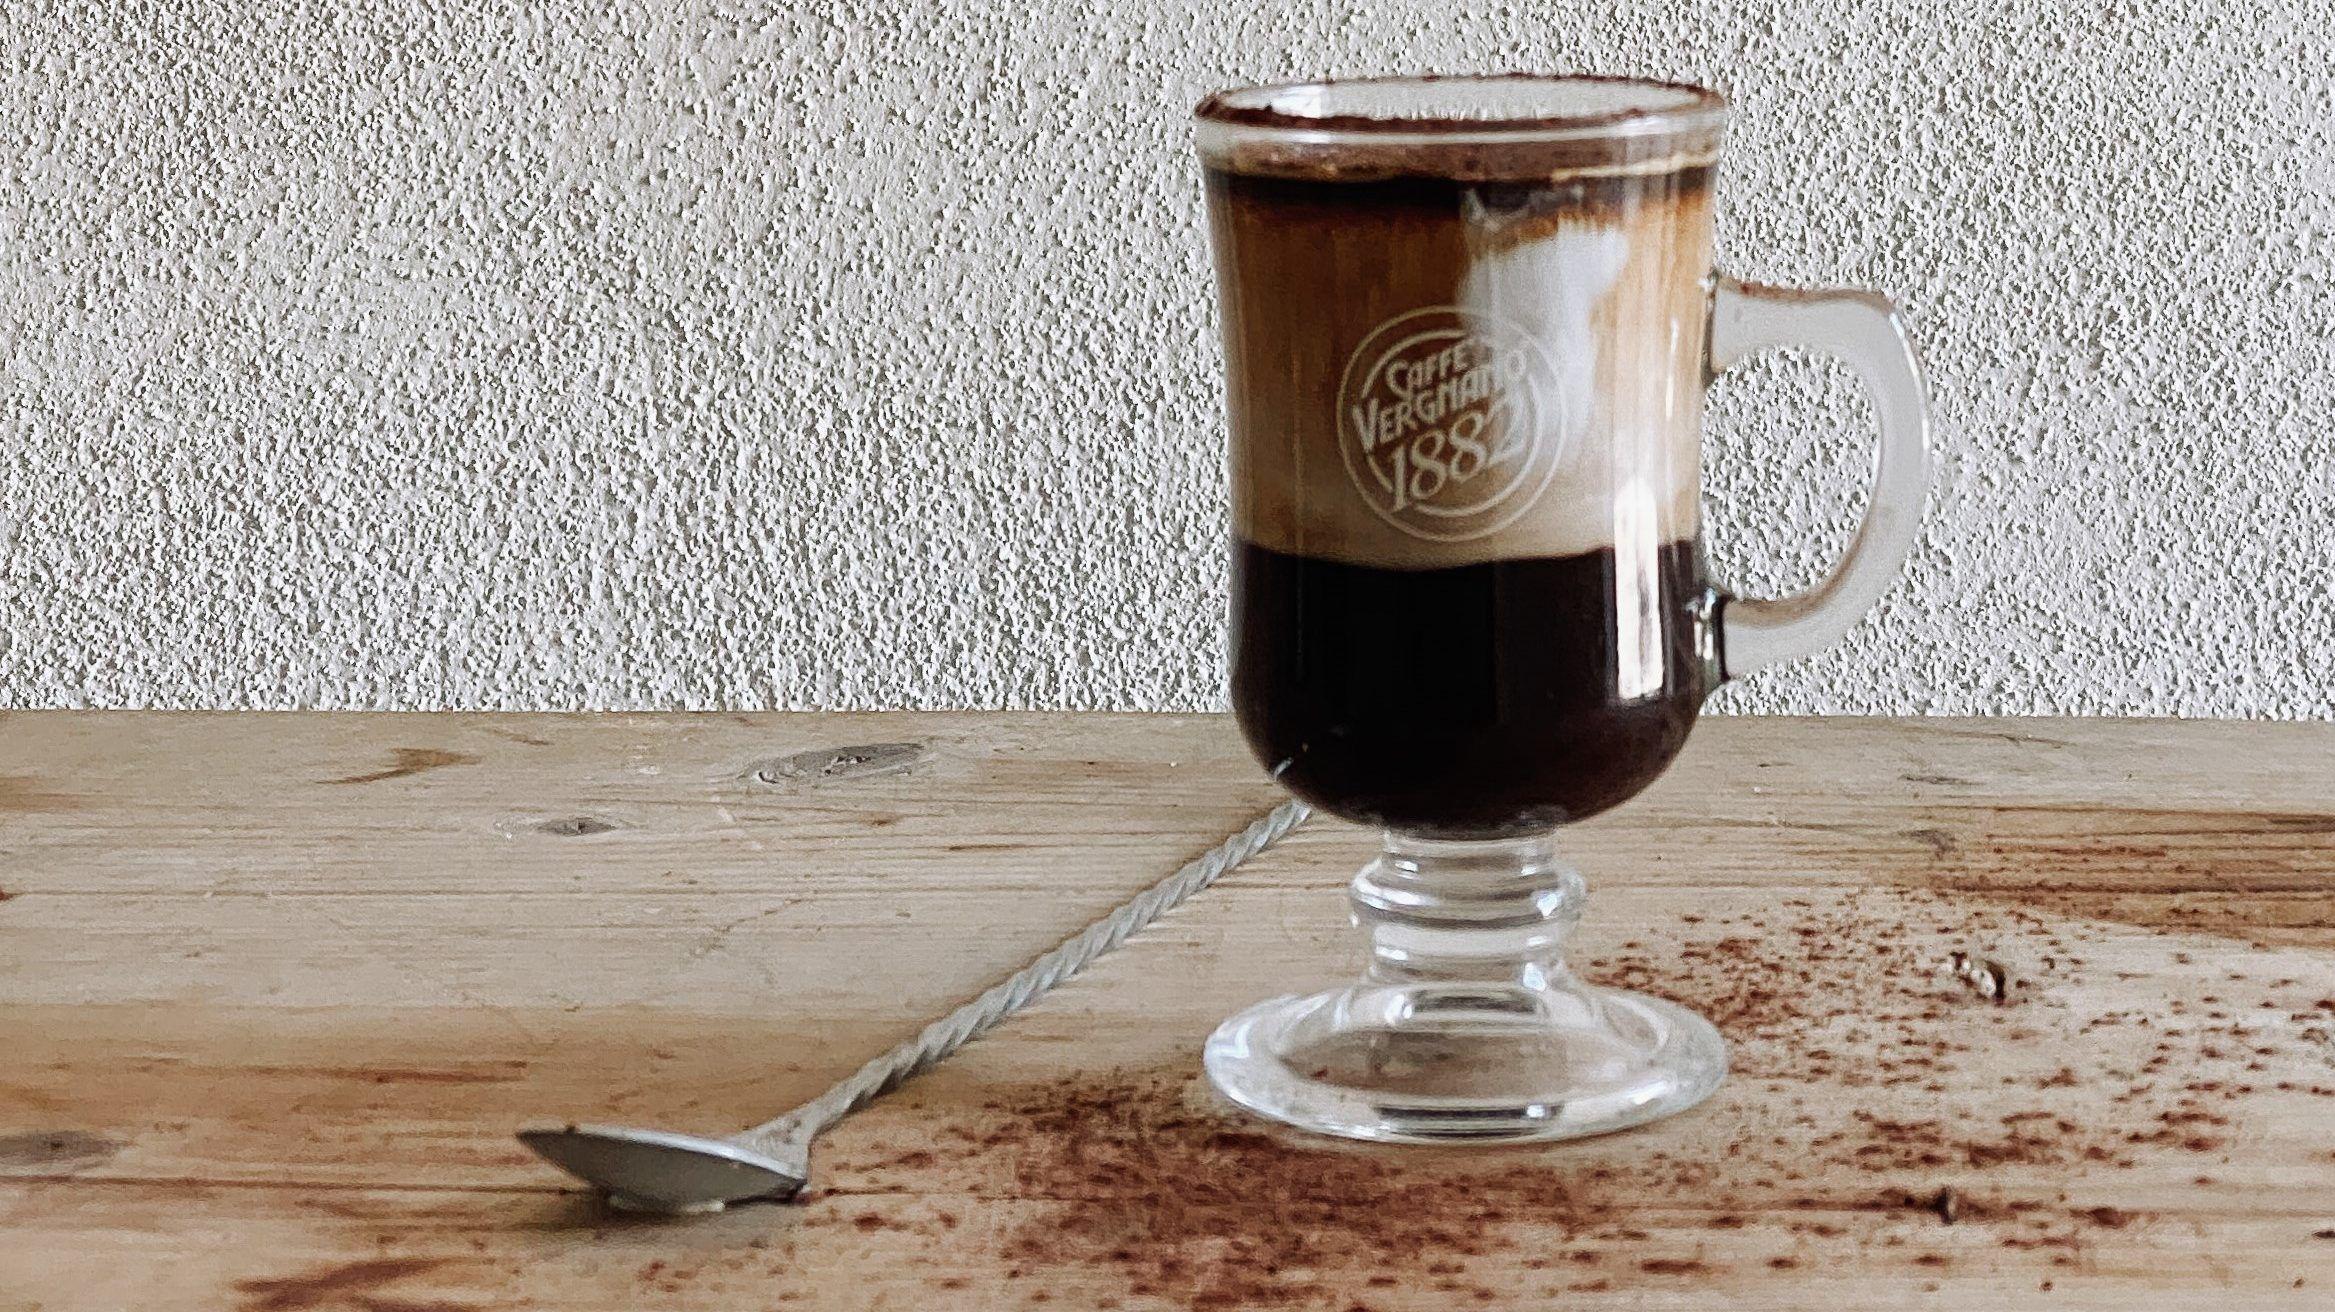 Drink al caffè: la ricetta del Bicerin